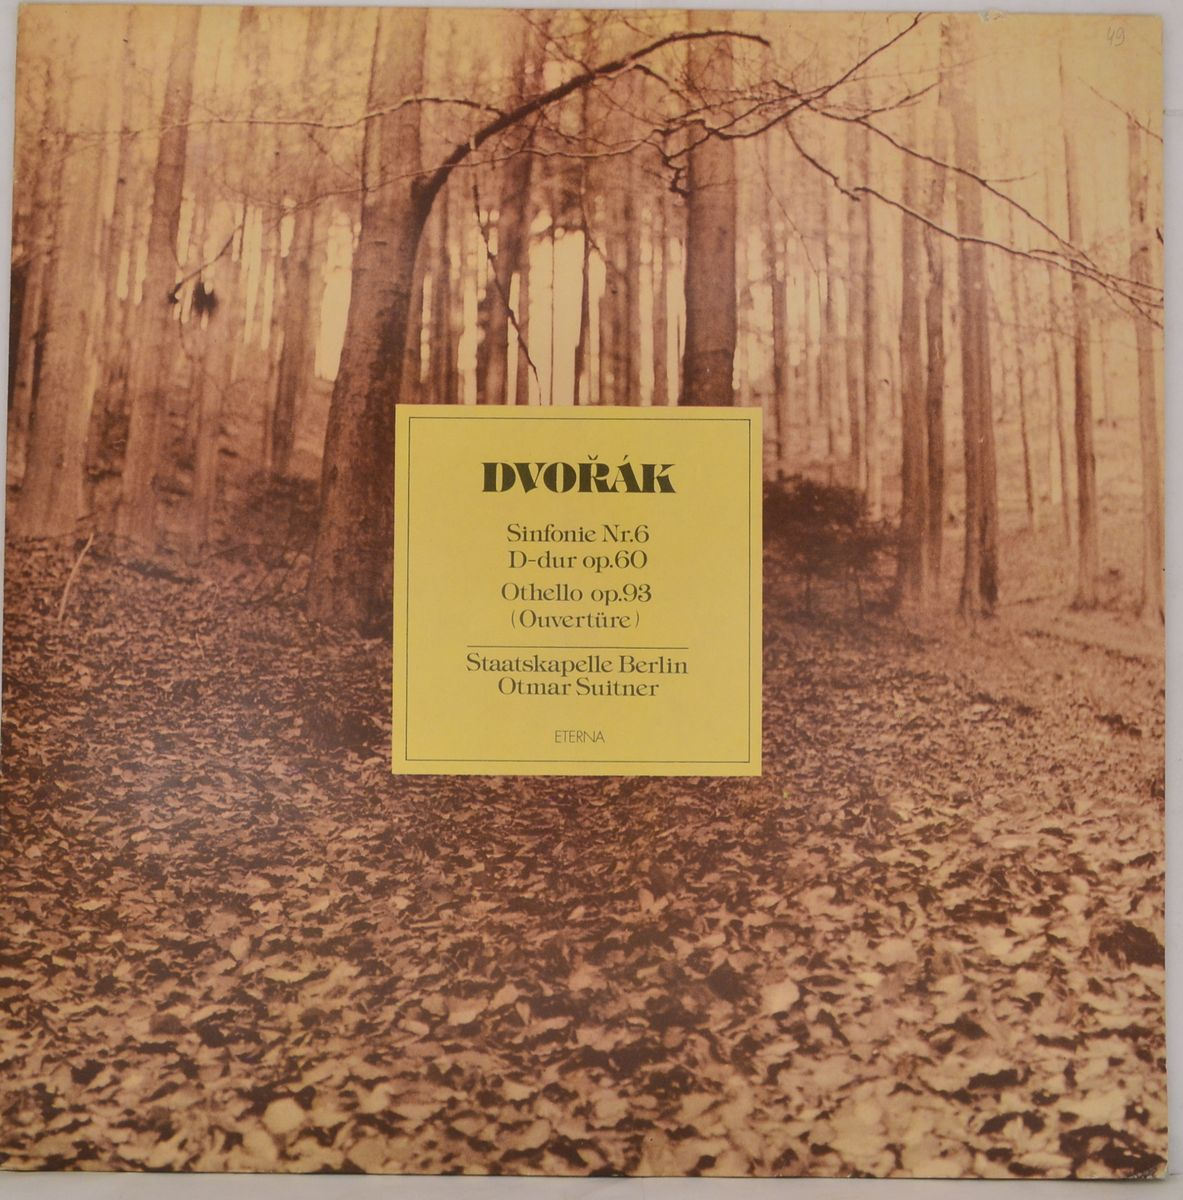 Dvorak, Otmar Suitner, Staatskapelle Berlin – Sinfonie Nr. 6 D-dur Op. 60 / Othello Op. 93 (Ouverture) (LP)